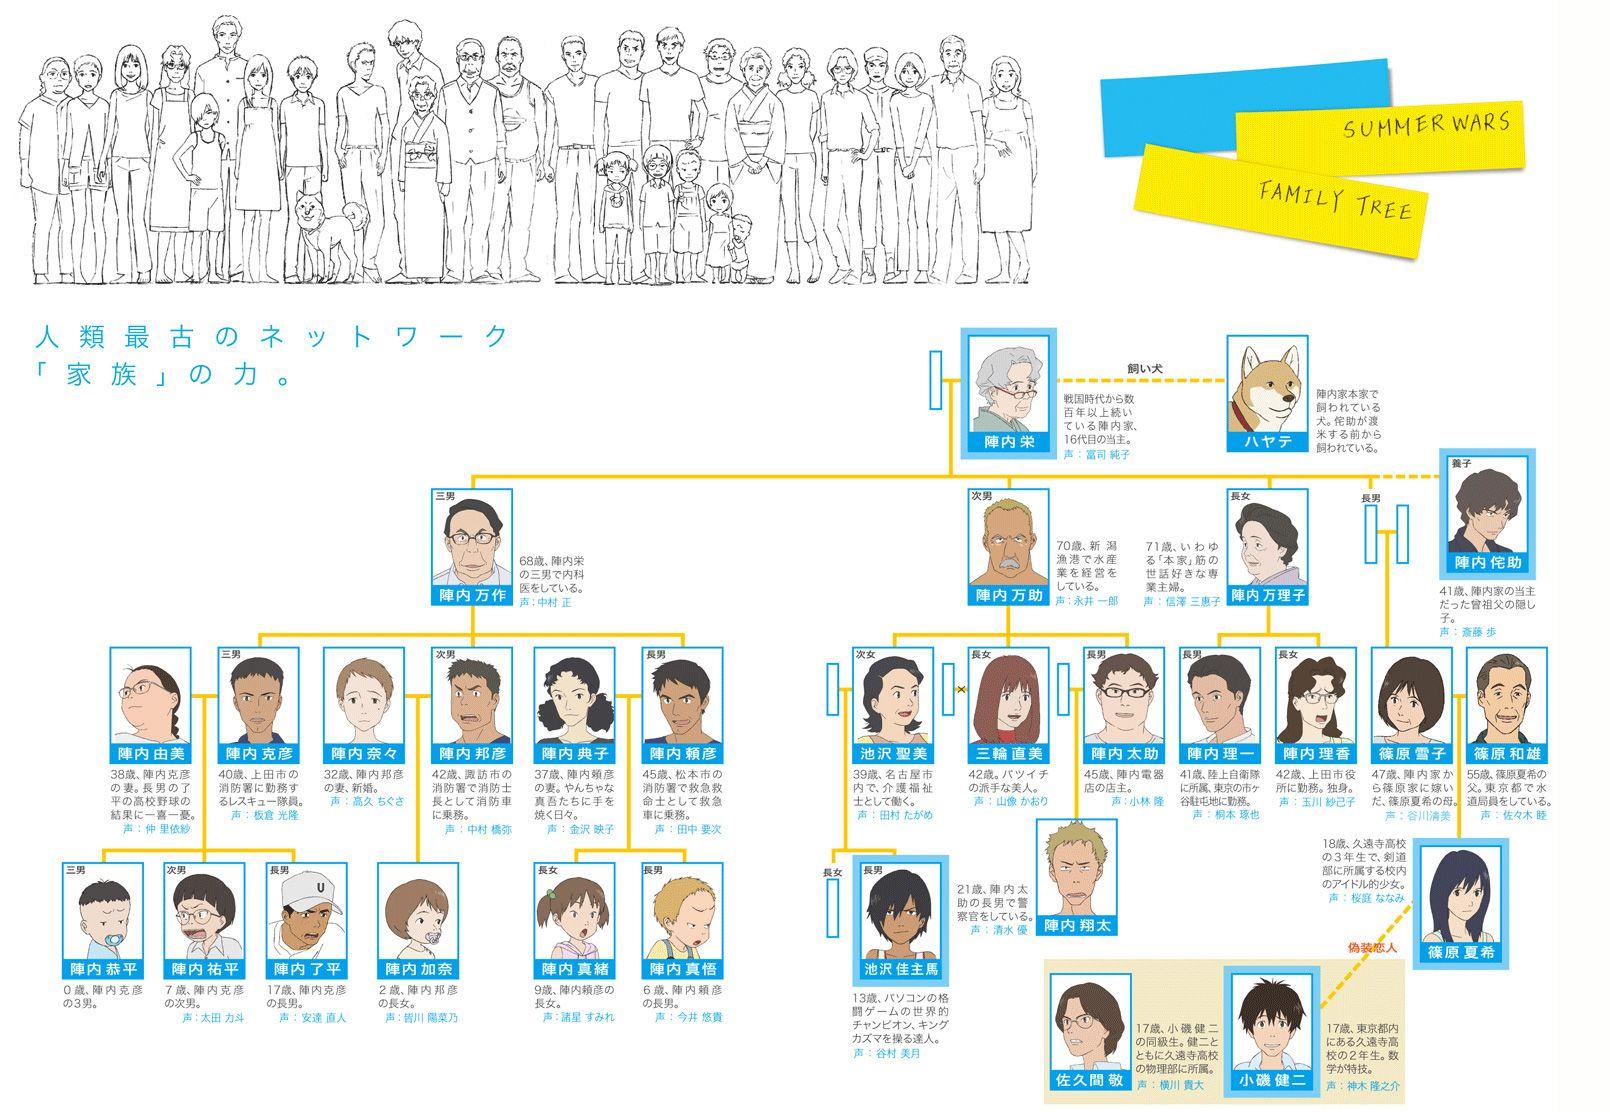 summer wars family tree ☜ ☞ Anime / Character / CG